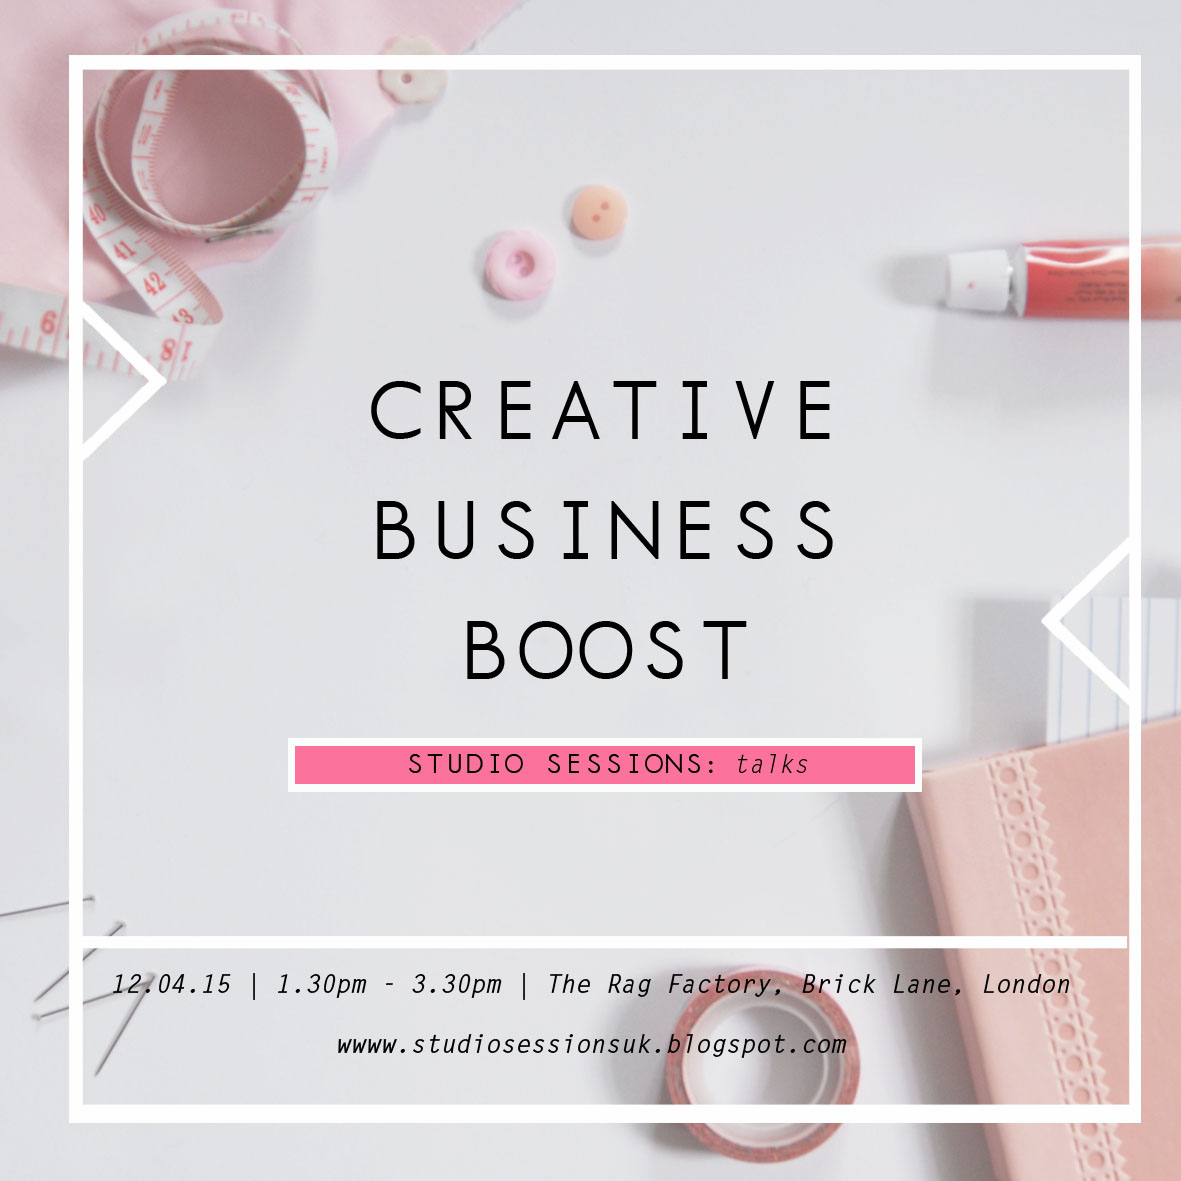 creativebizboost.eventbrite.co.uk